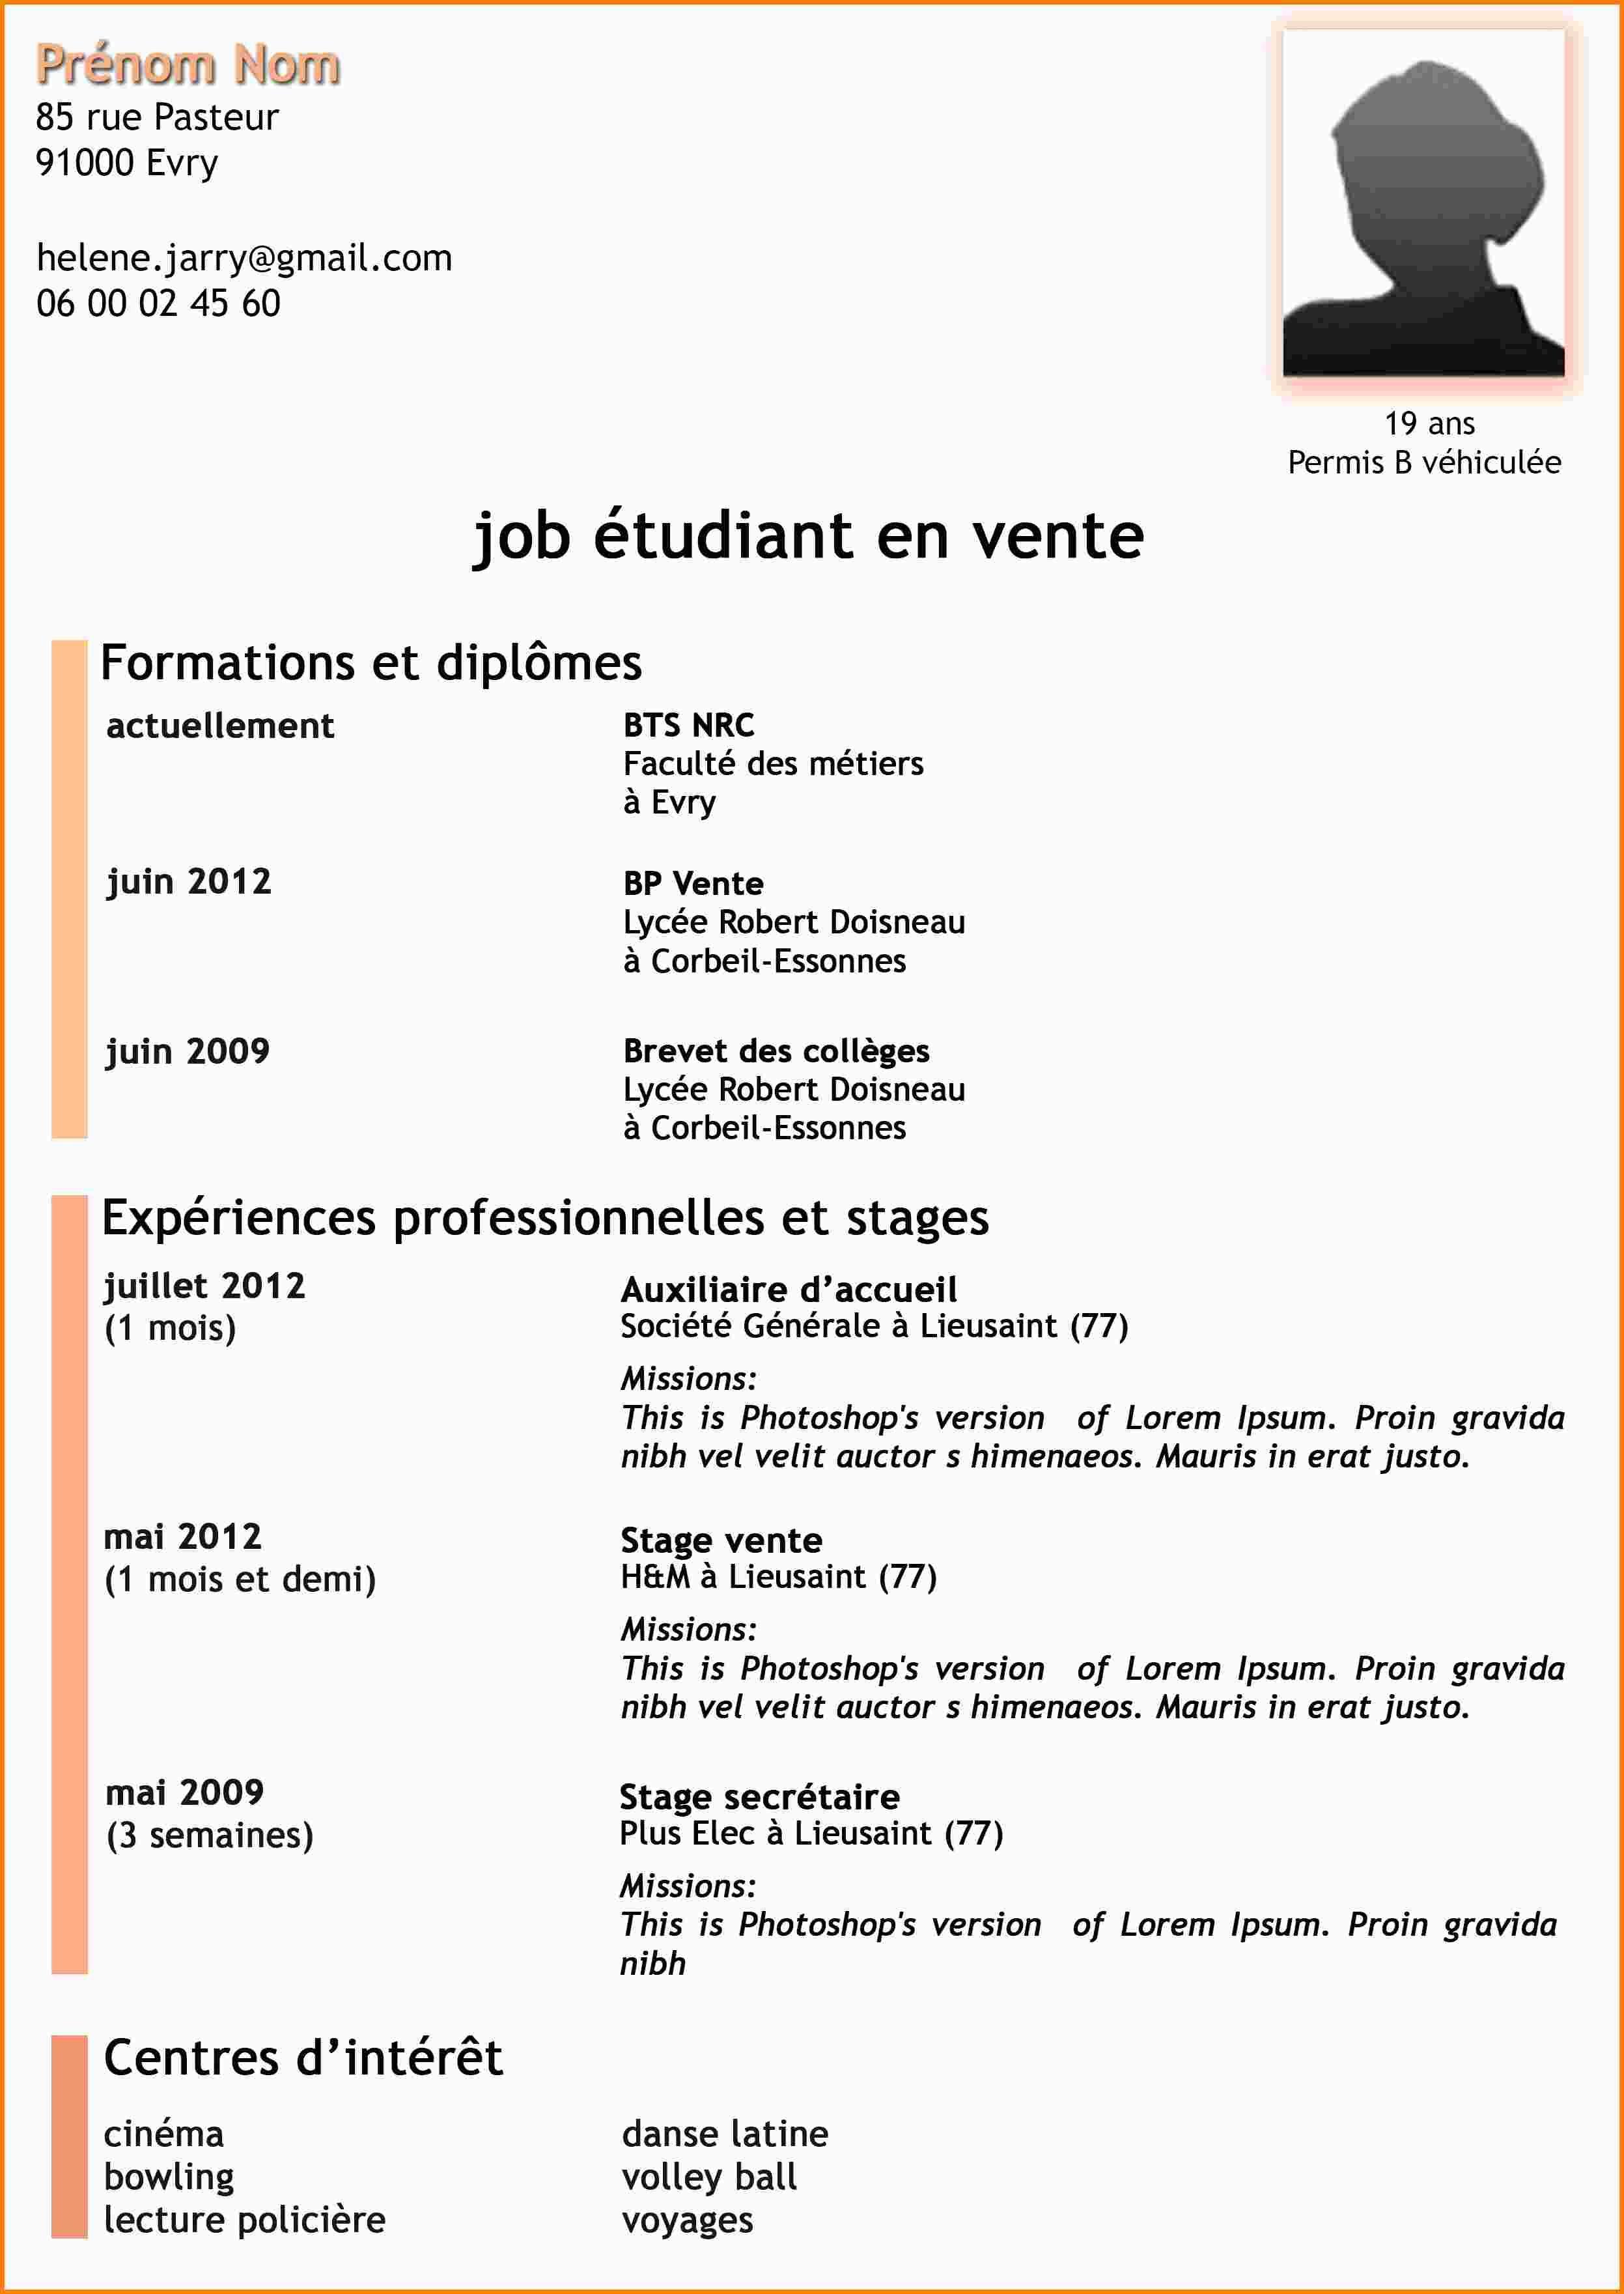 Telecharger Modele Cv Job Ete Lyceen Exemple De Cv Etudiant Exemple Cv Cv Job Etudiant